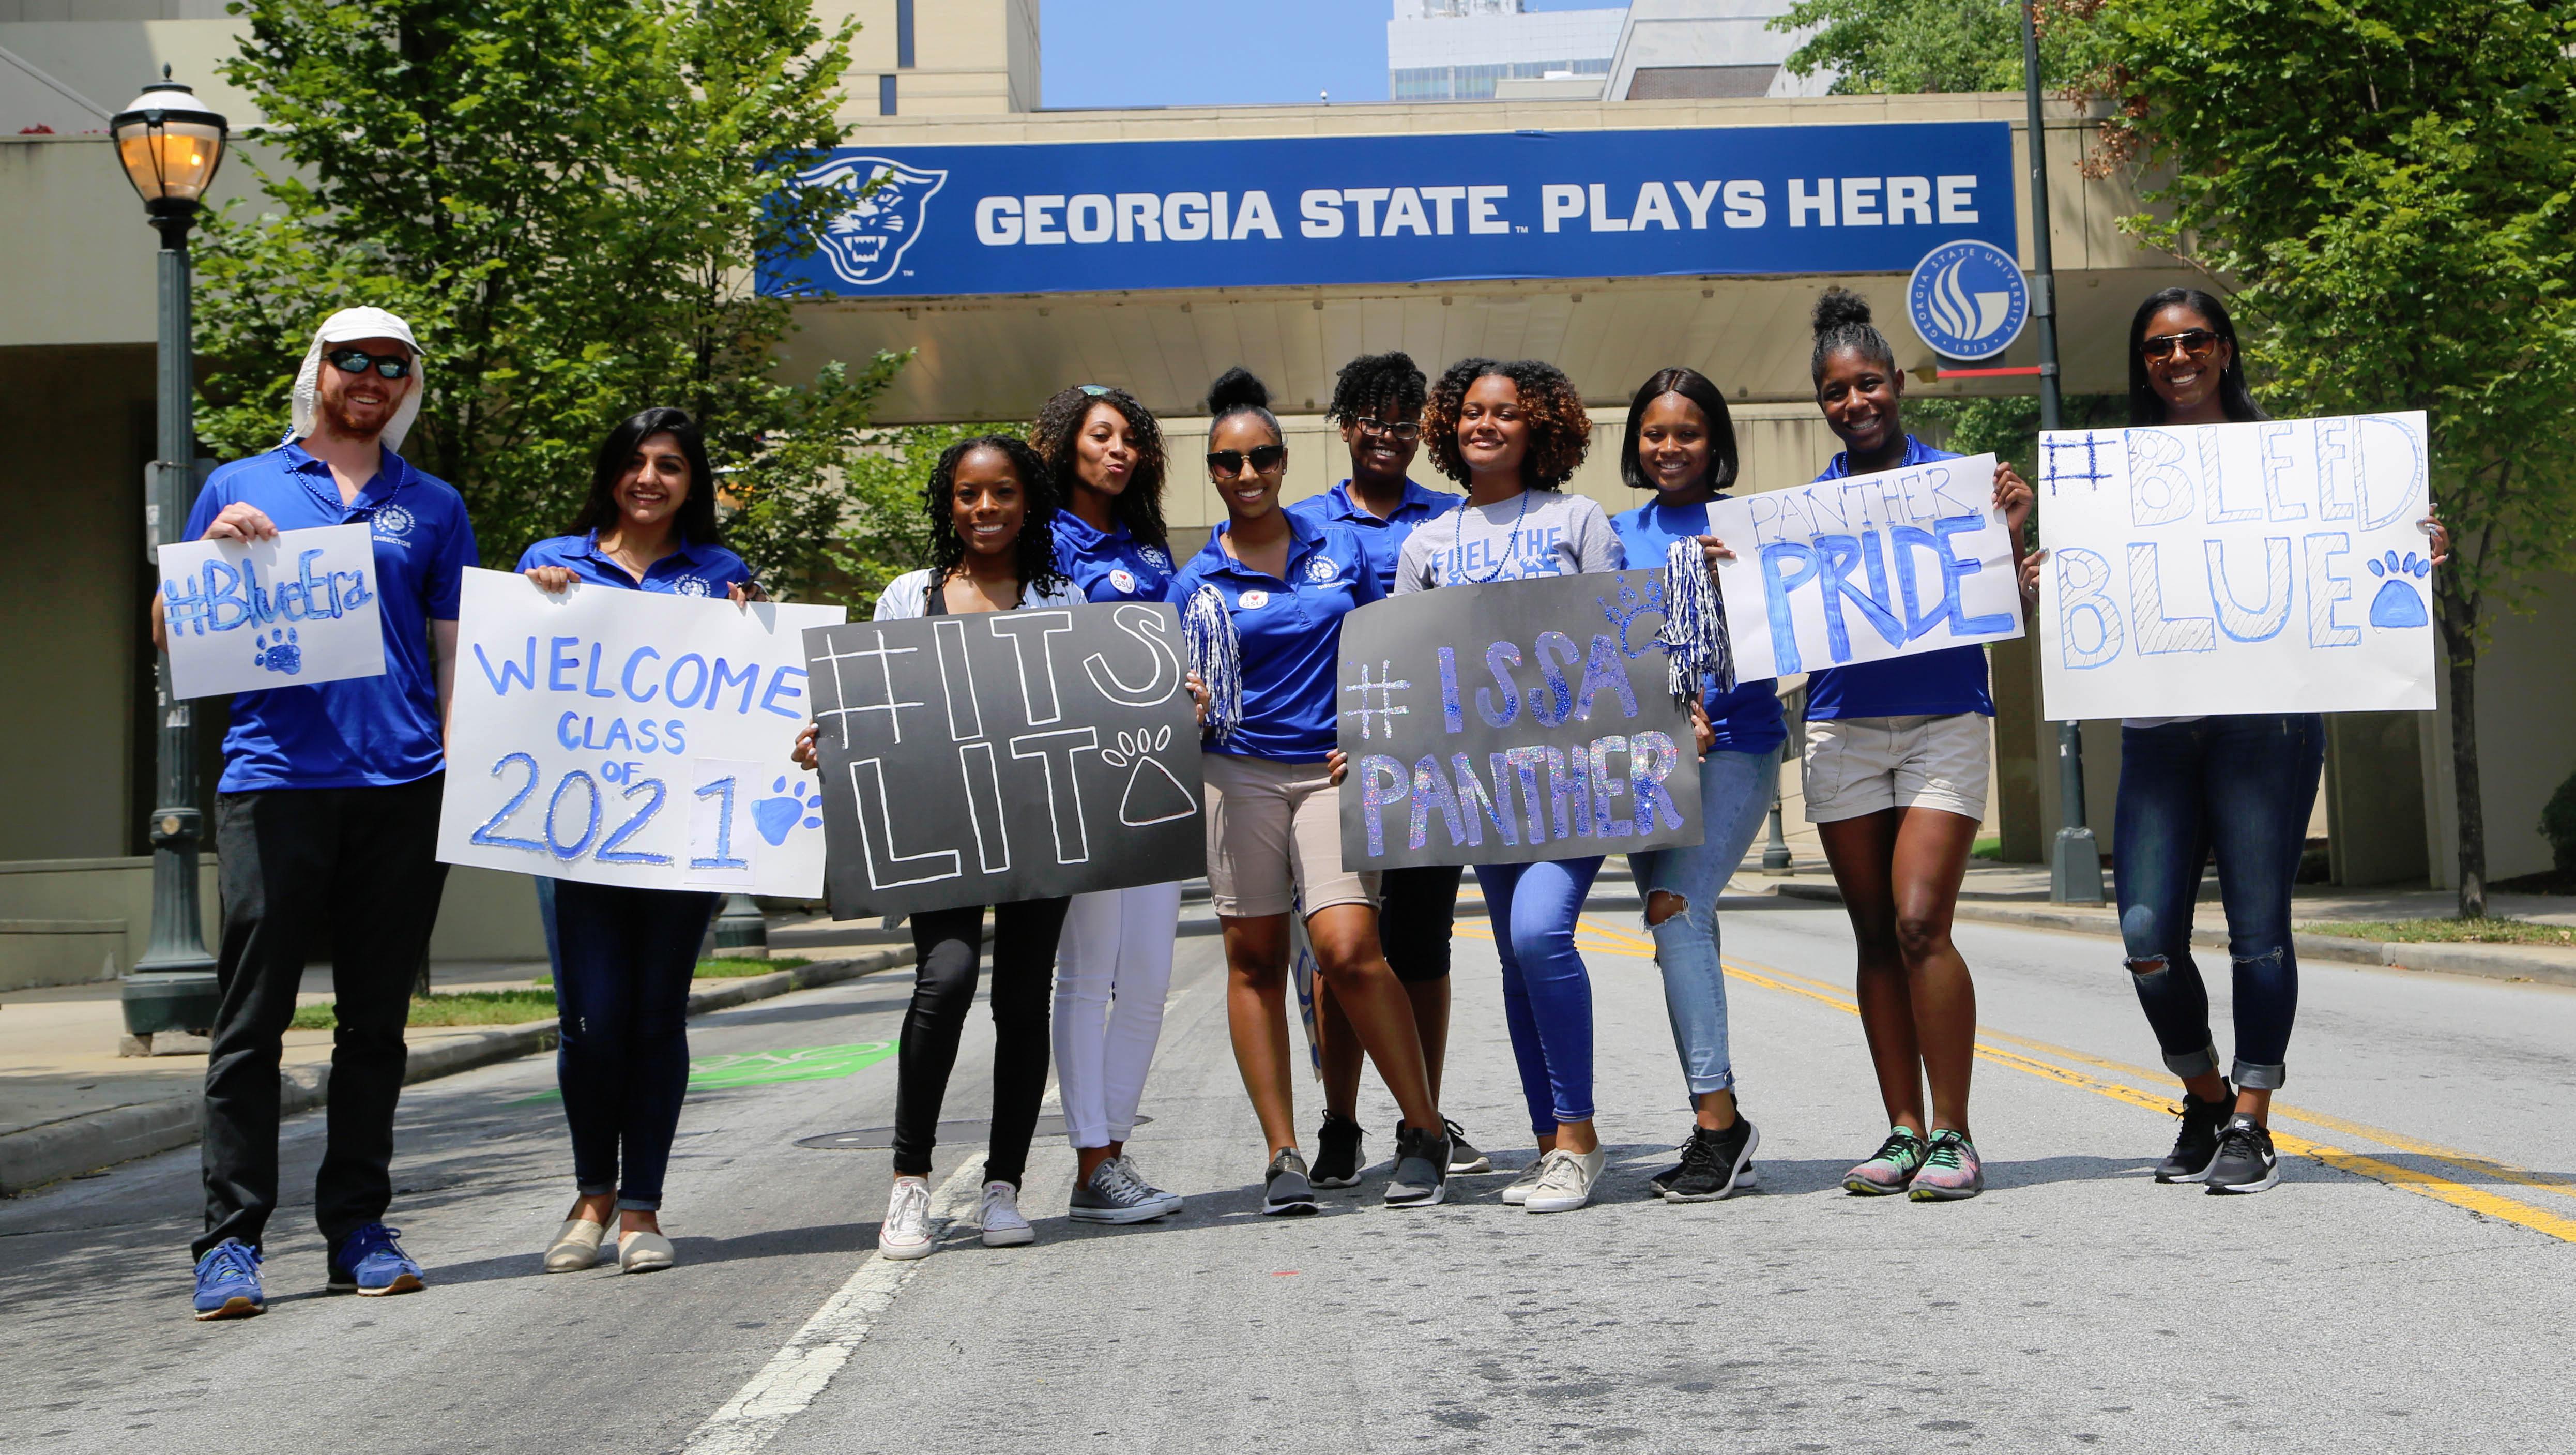 Gsu Alumni Association - Student Alumni Association With Georgia State University Summer 2021